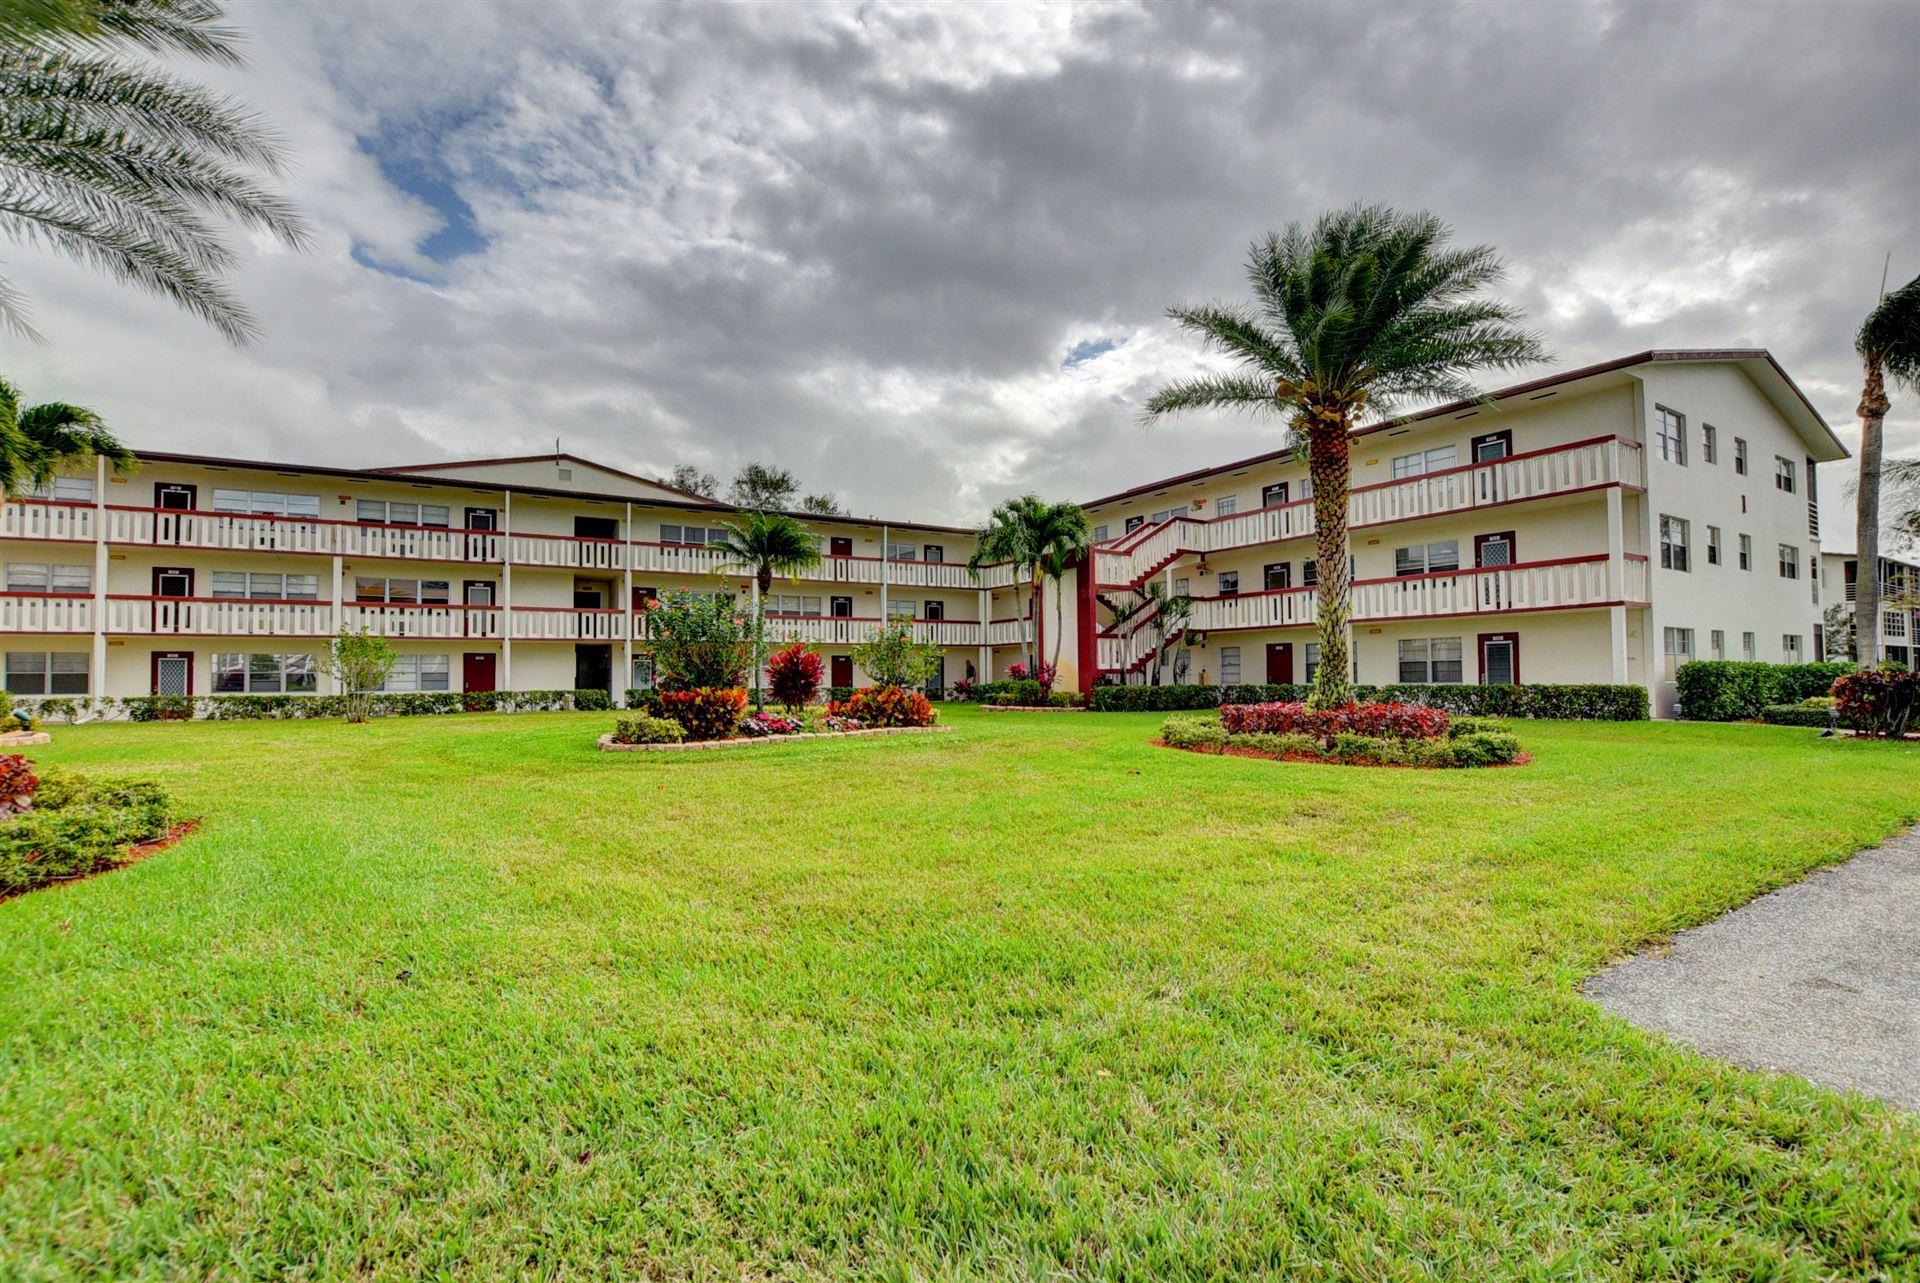 361 Fanshaw I, Boca Raton, FL 33434 - #: RX-10593562